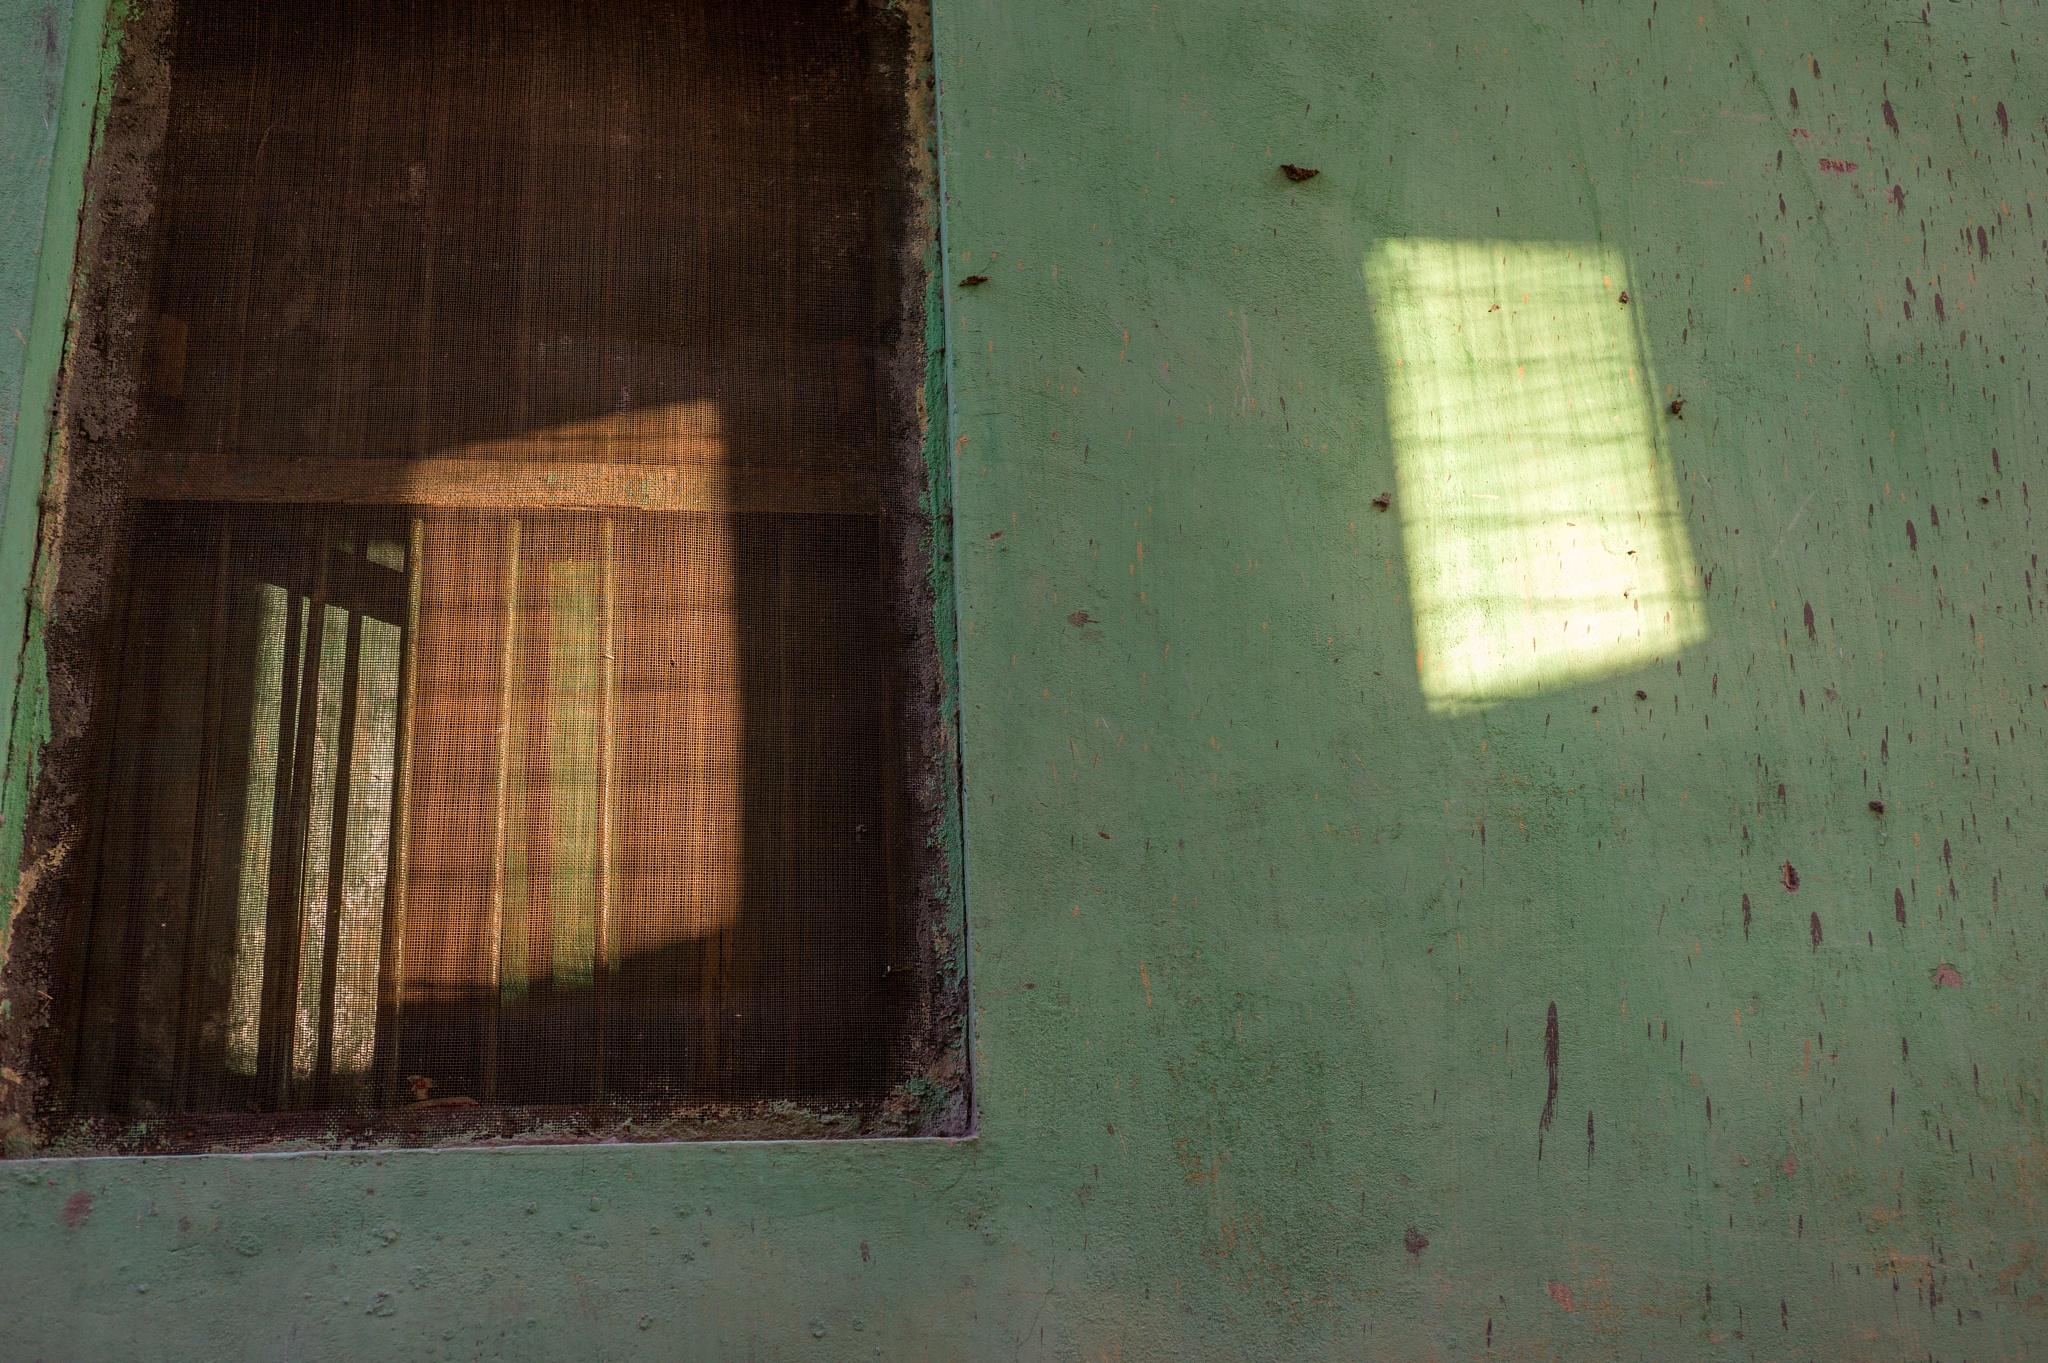 Rishikesh, India by NigelMeaby